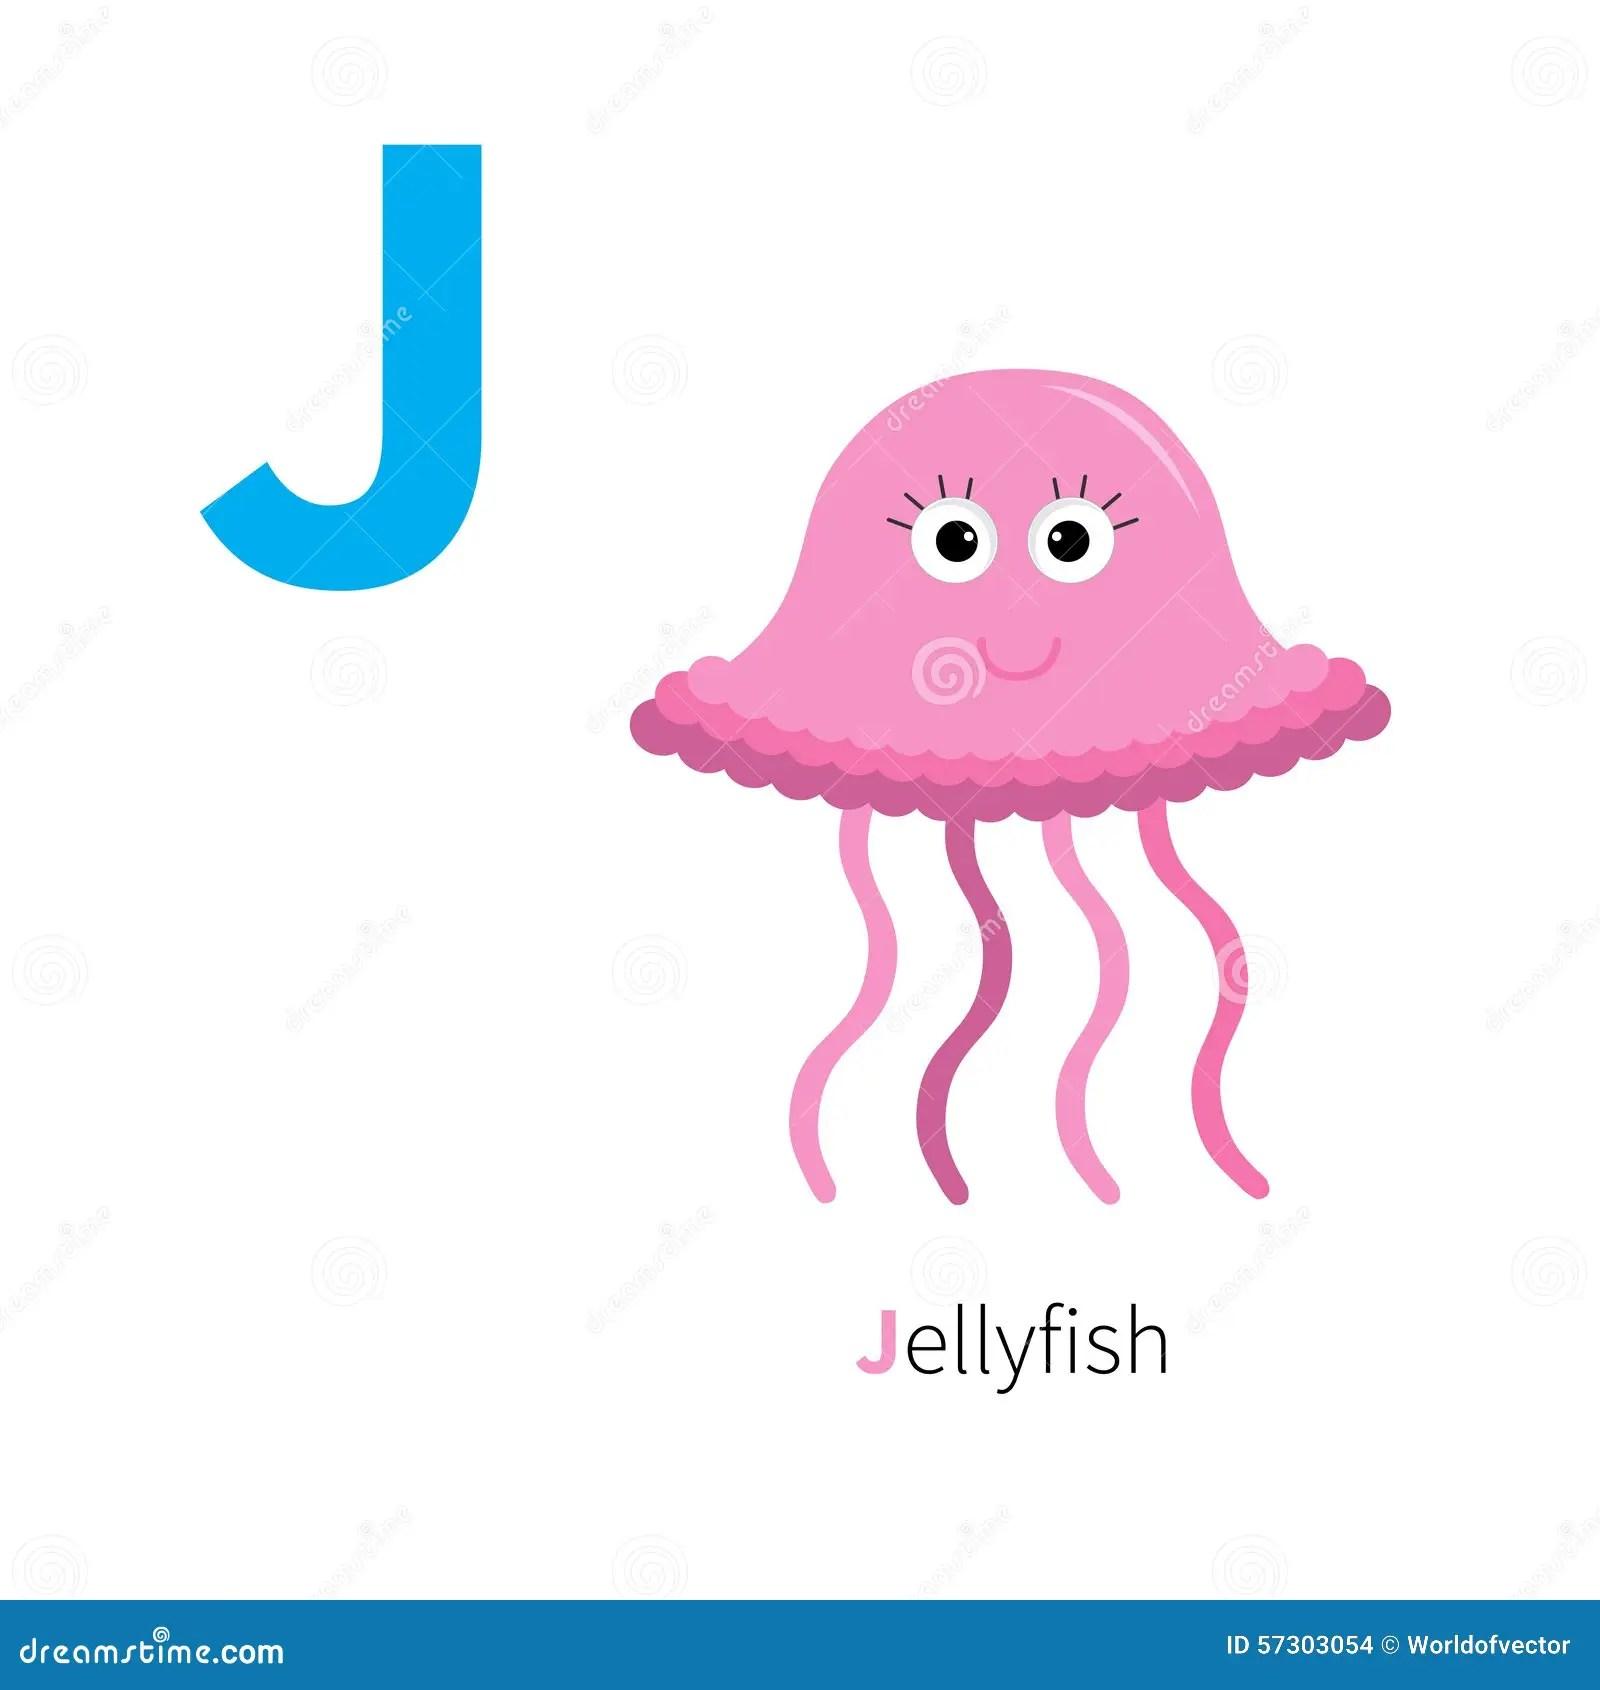 Letter J Jellyfish Zoo Alphabet English Abc With Animals